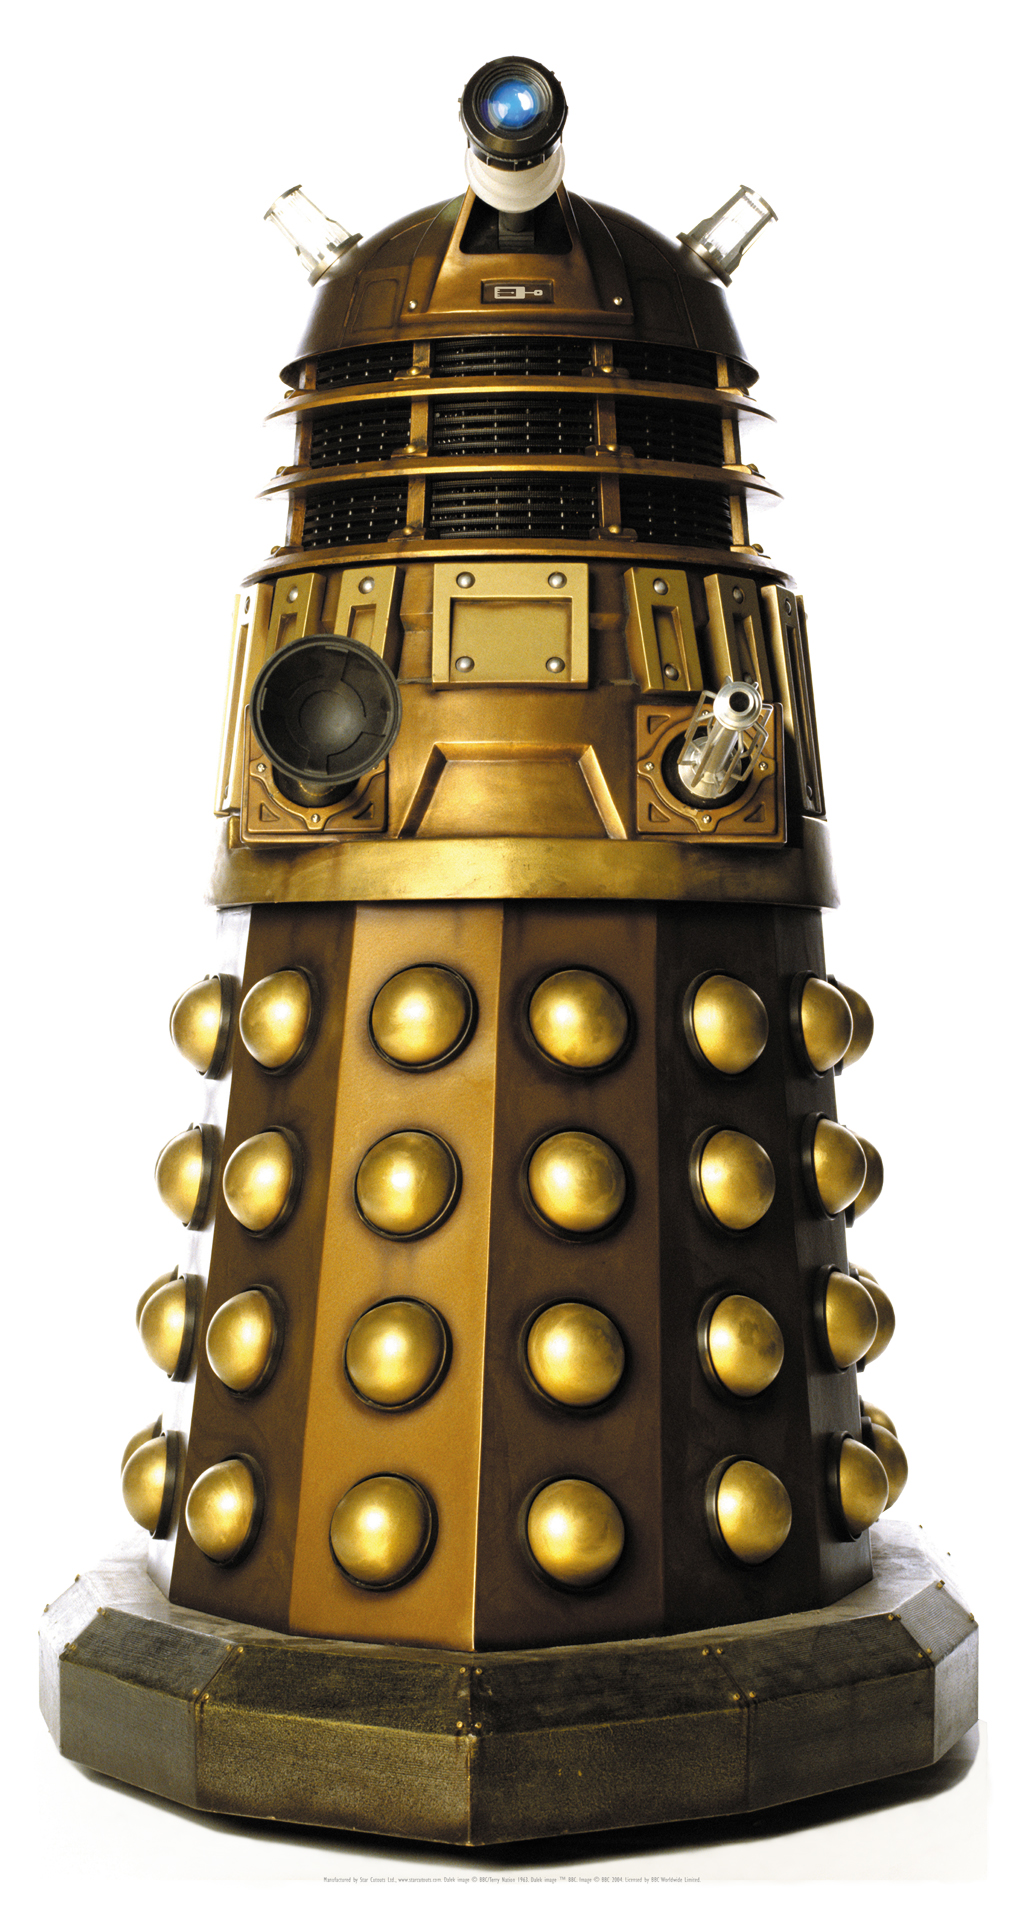 Doctor Who Wallpaper Dalek Exterminate Dalek - Doctor Who Wik...